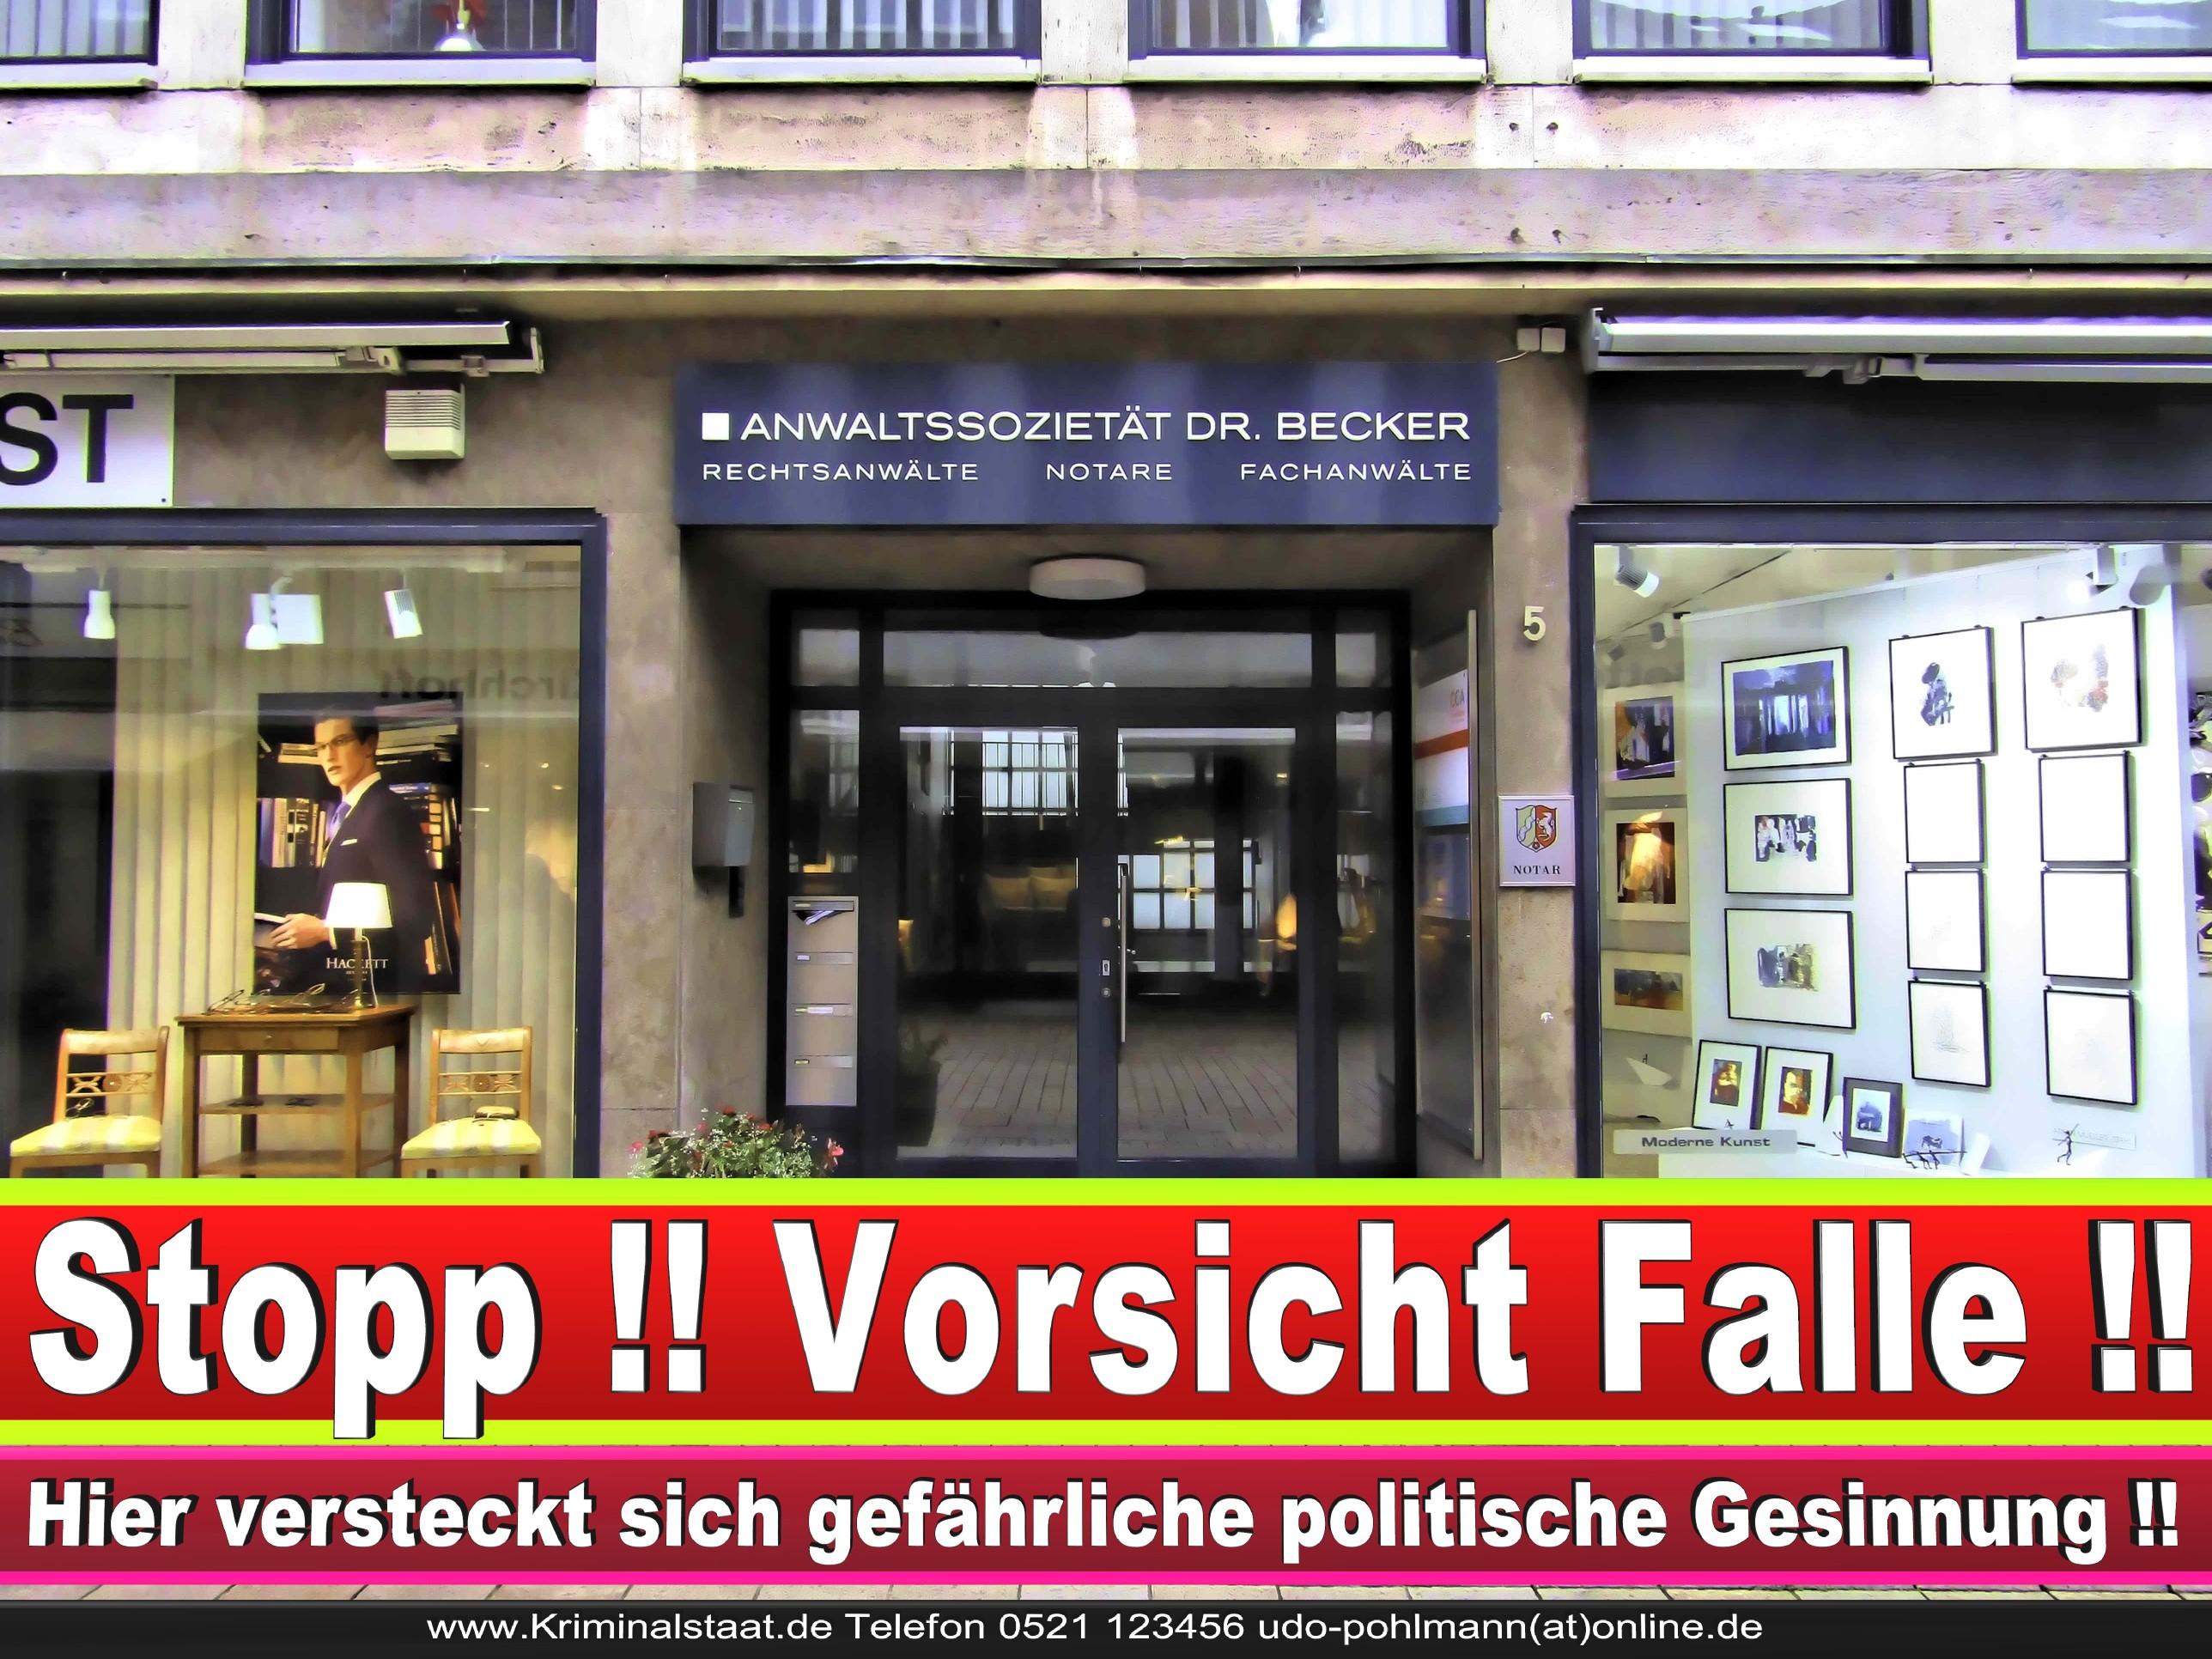 RECHTSANWALT DR THORSTEN FELDMANN CDU BIELEFELD Rechtsanwalt Und Notar A D Werner Kaup LANDTAGSWAHL BUNDESTAGSWA L BÜRGERMEISTER AHL NRW 1